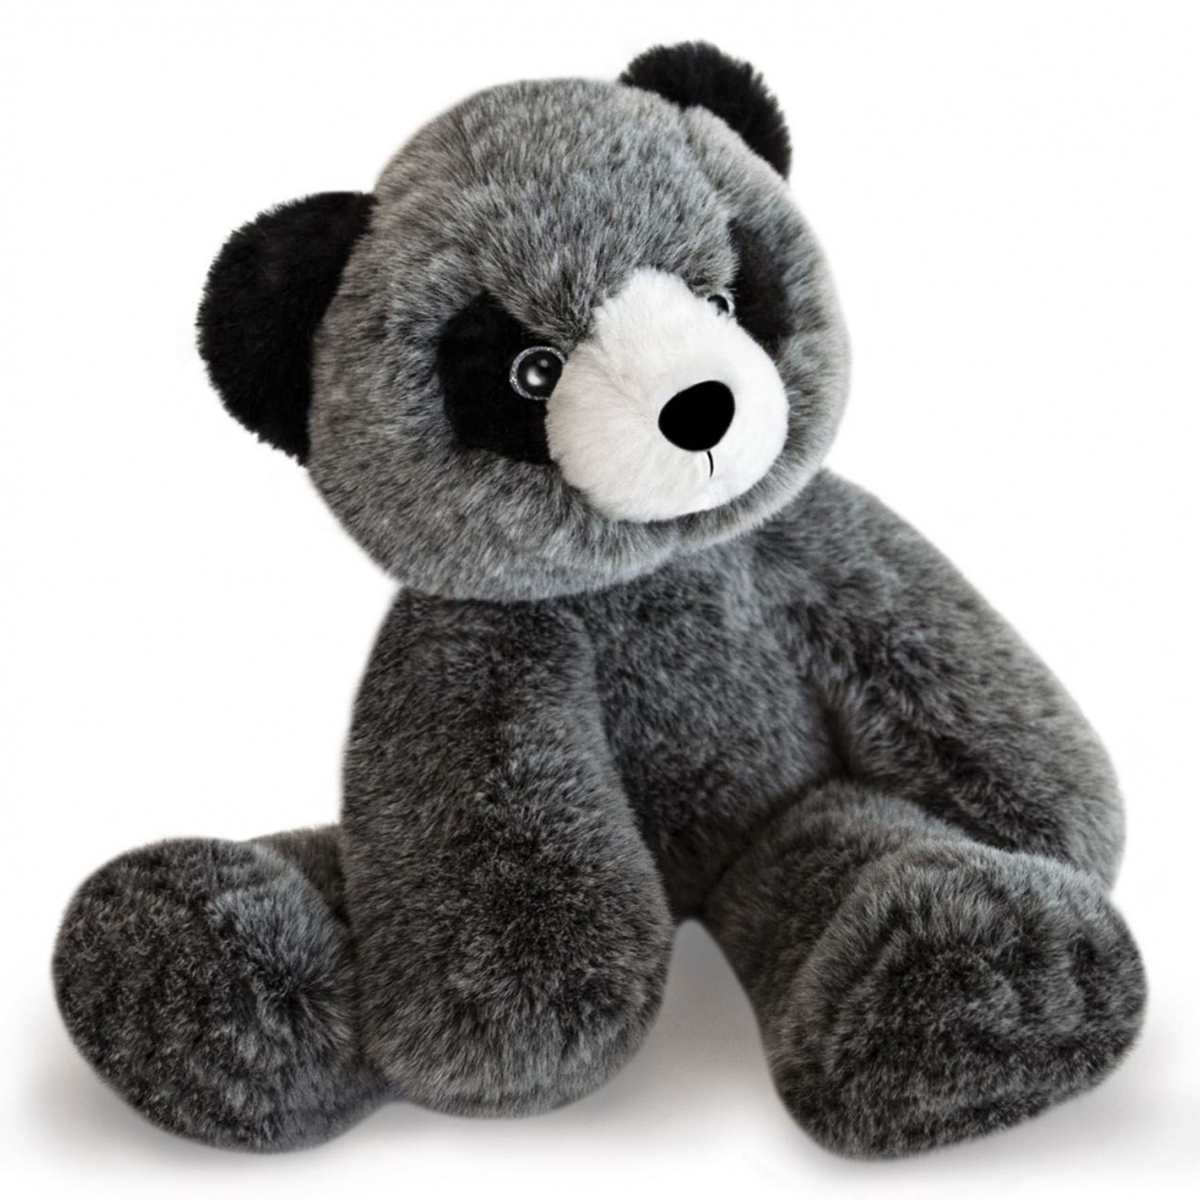 Peluche Peluche Sweety Mousse Panda - Moyen Peluche Panda Sweety Mousse 25 cm